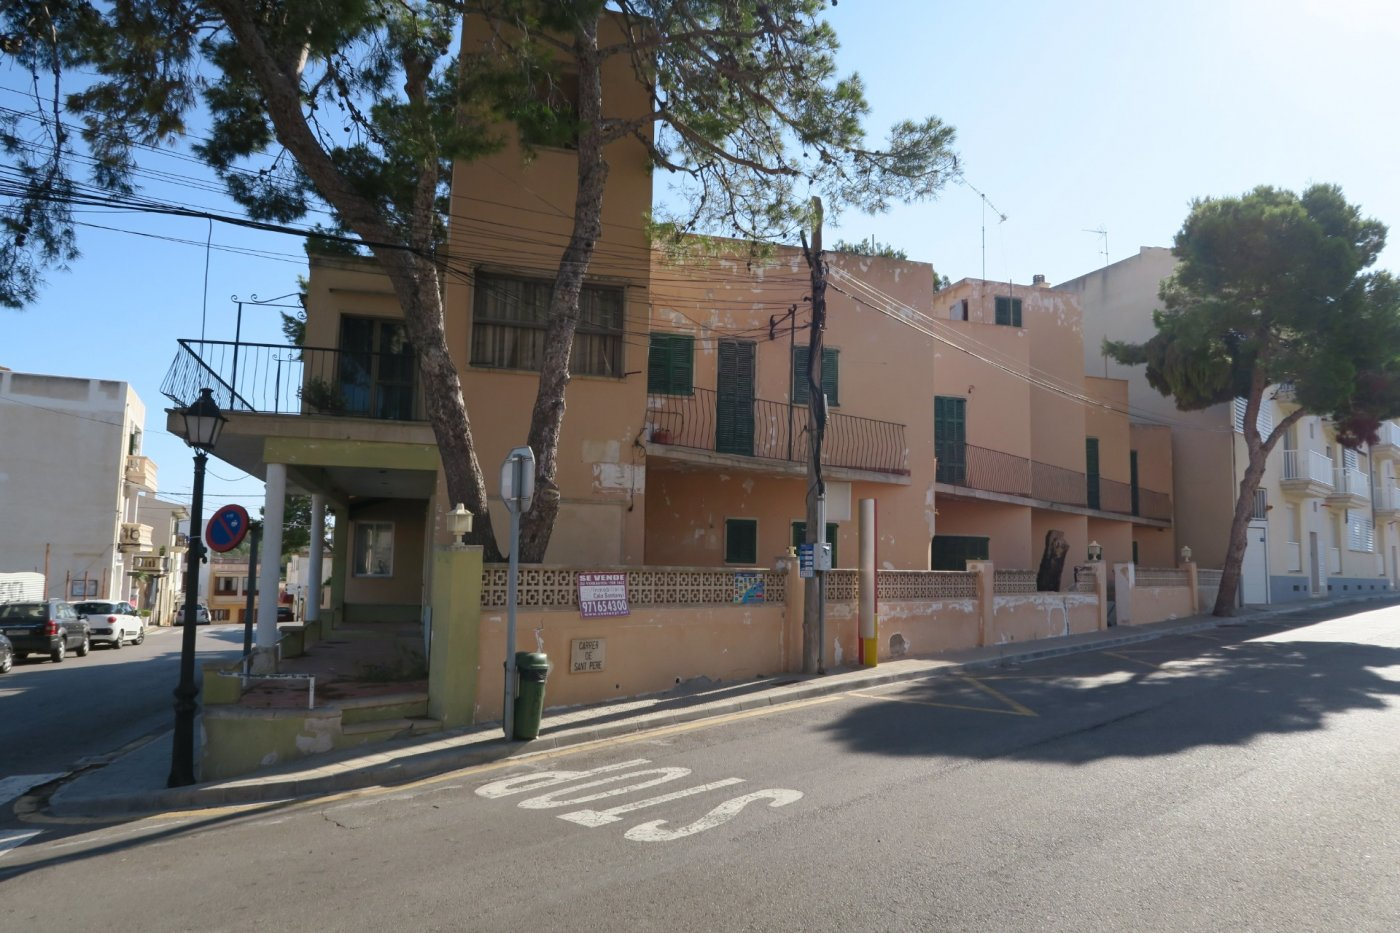 Edificio  Santanyí ,cala figuera. Edificio en cala figuera .